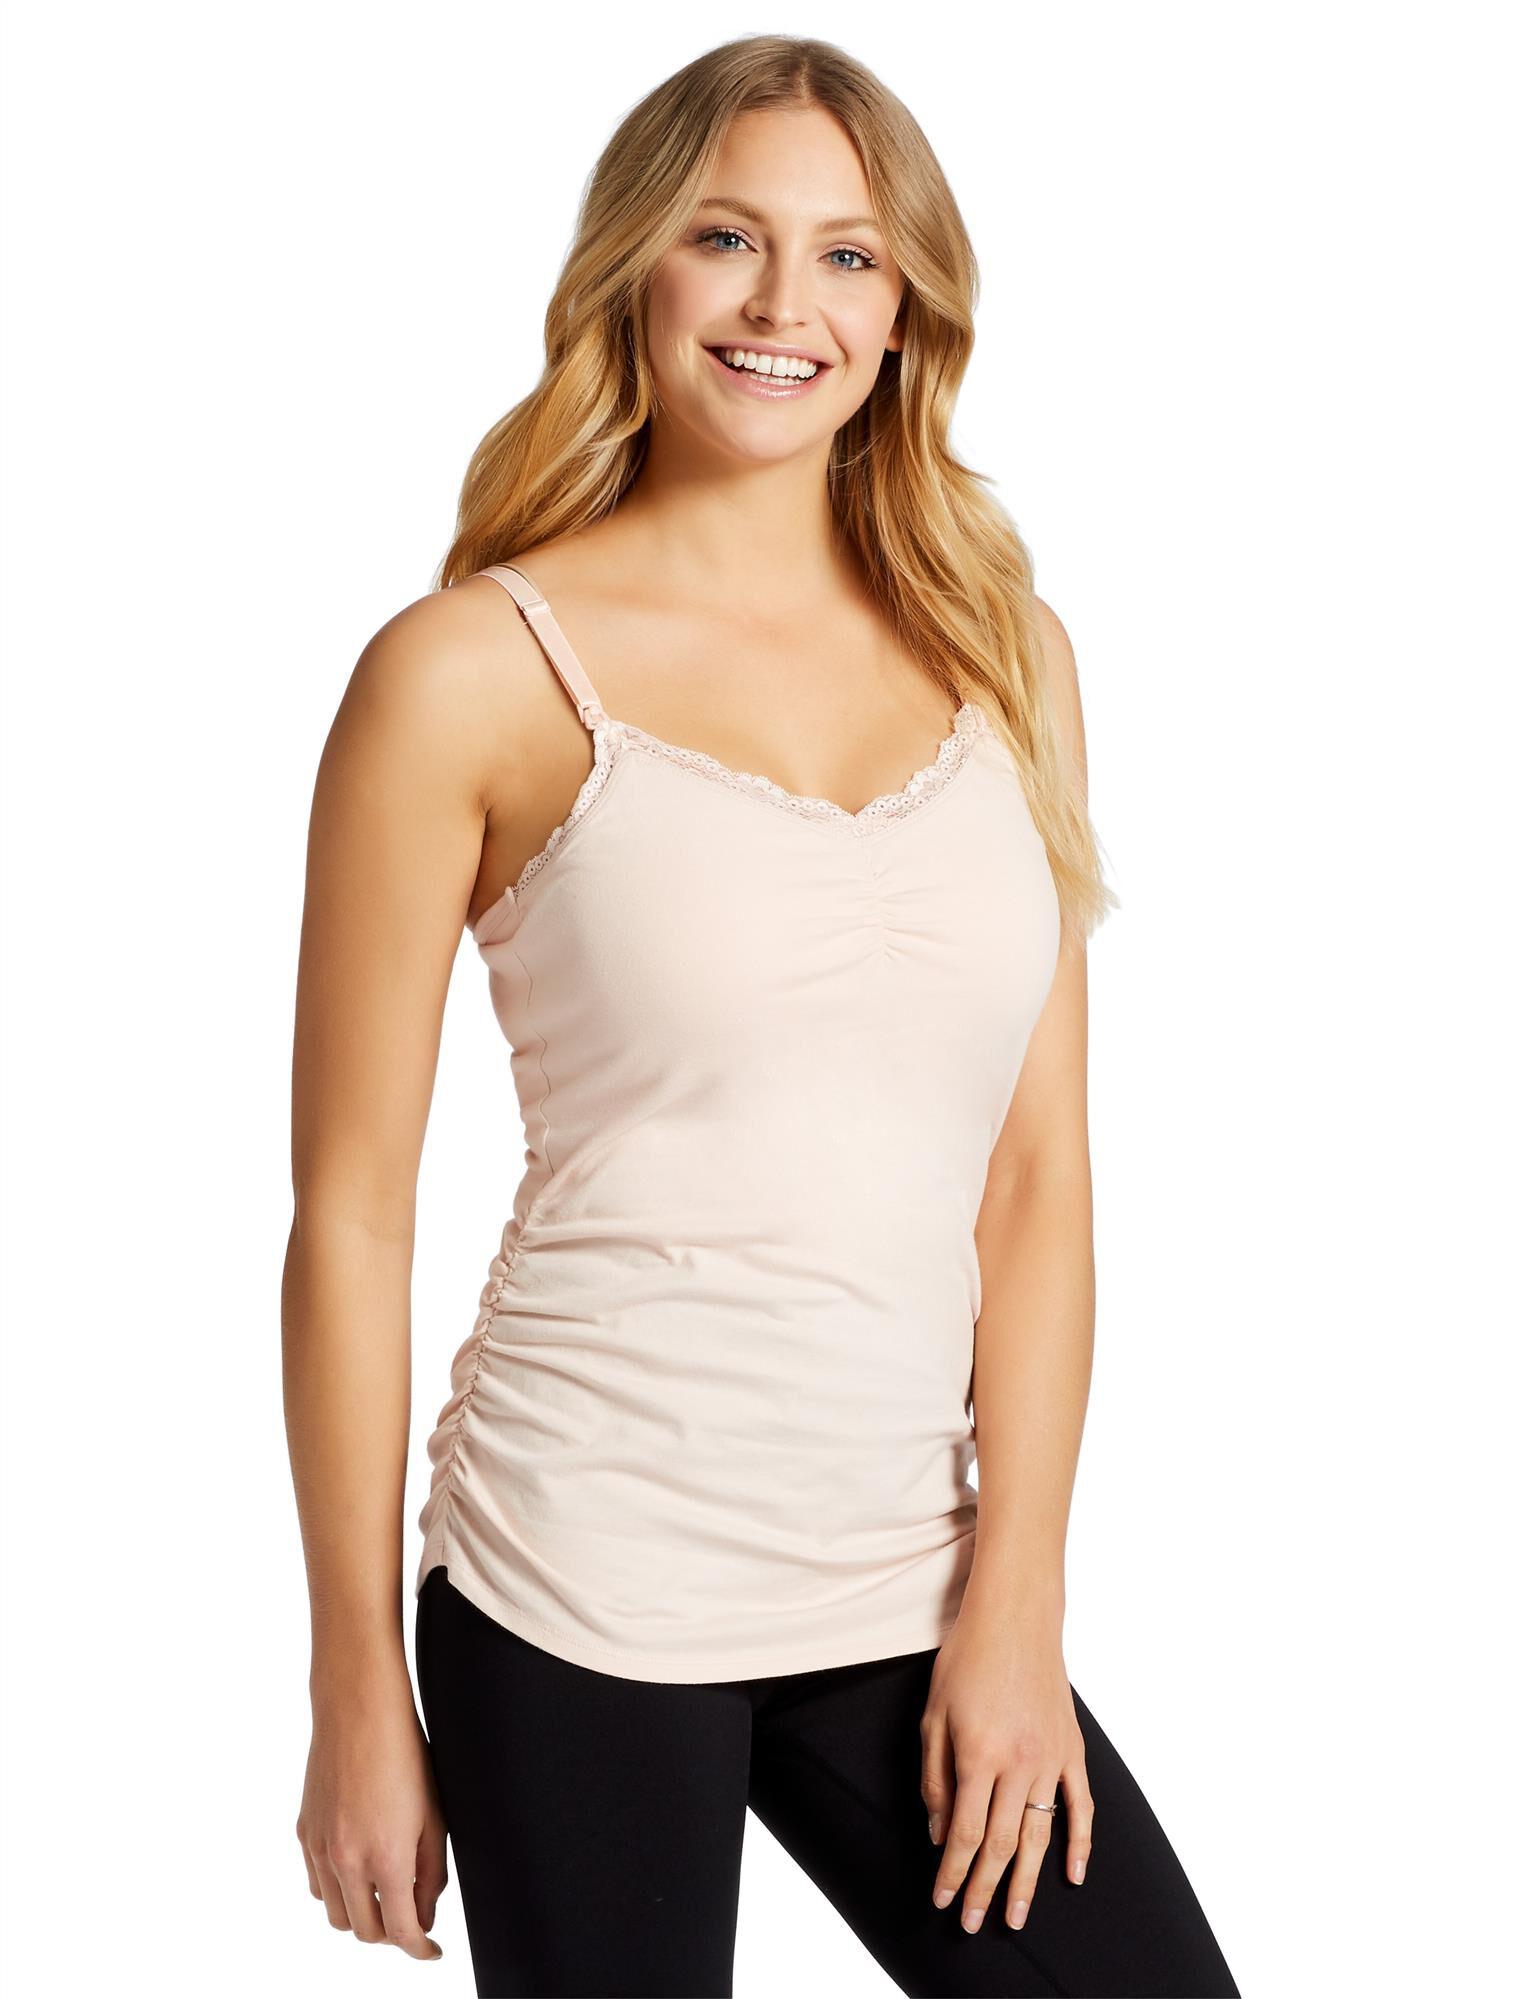 Jessica Simpson Clip Down Shelf Bra Nursing Cami- Solid